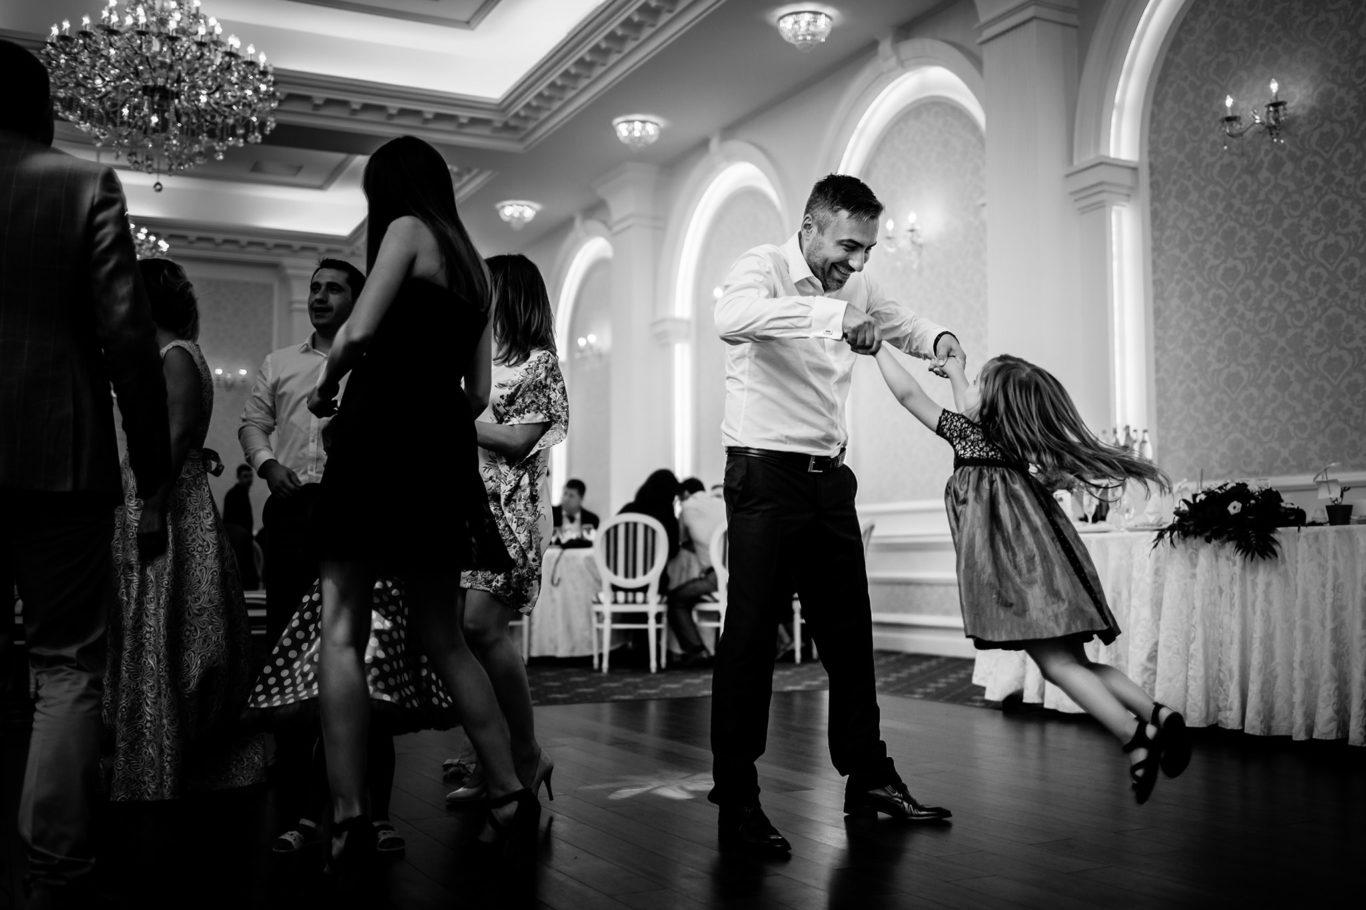 0633-fotografie-nunta-bucuresti-anca-george-fotograf-ciprian-dumitrescu-dcf_5764